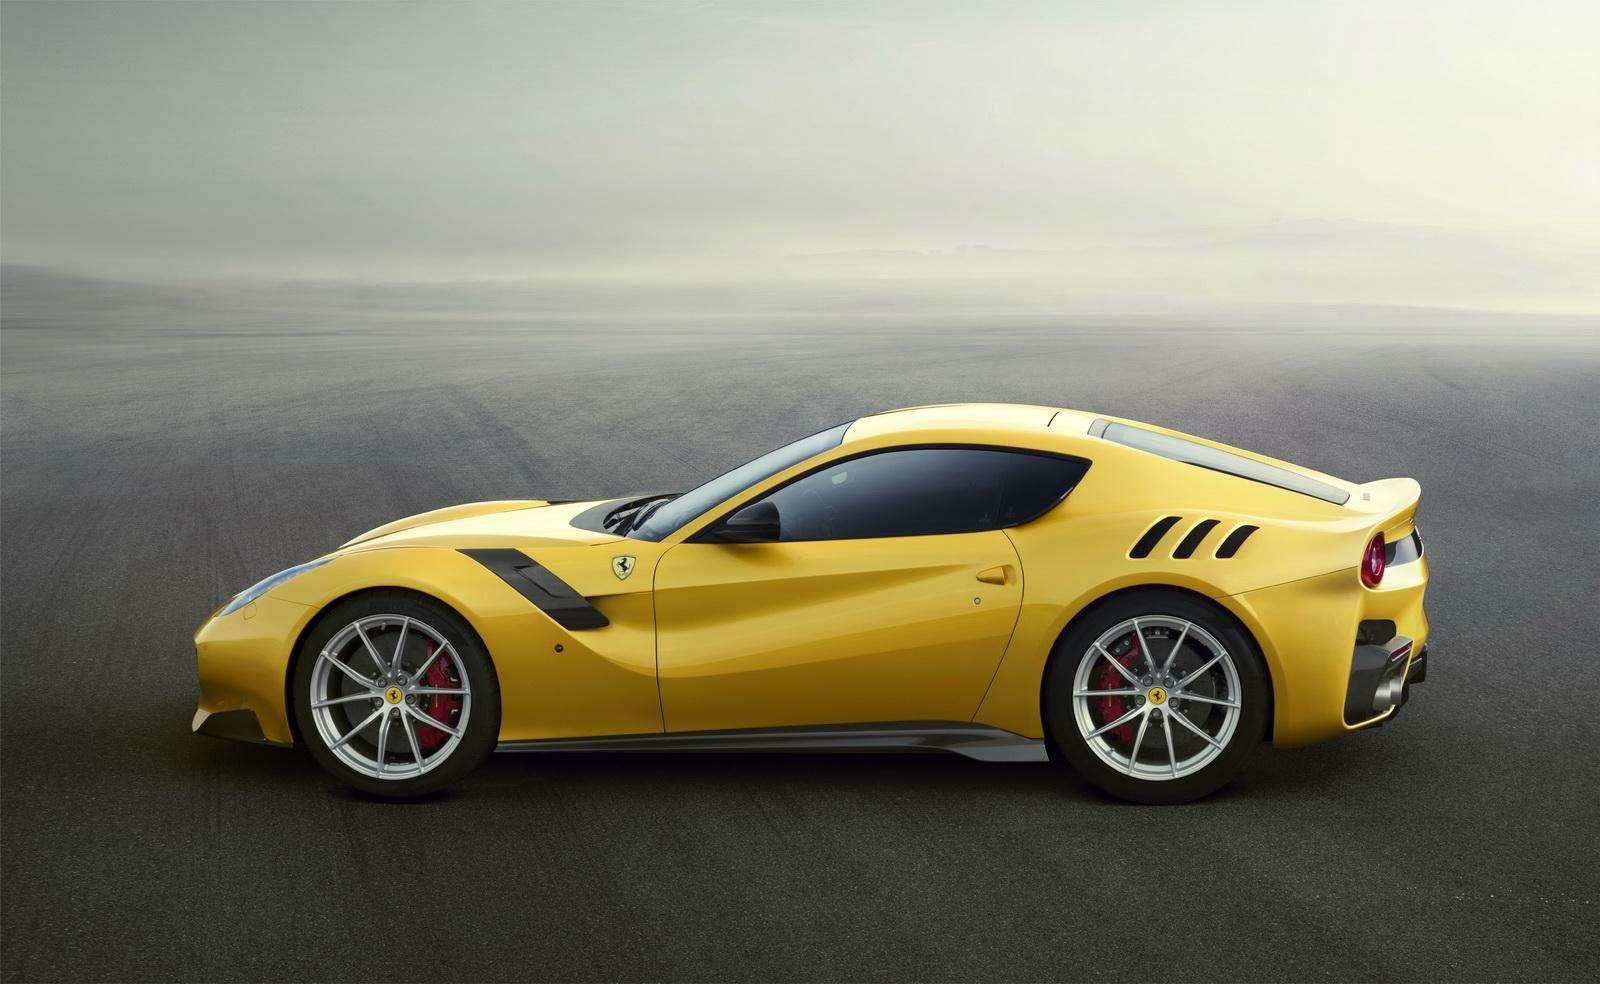 FerrariF12tdf3